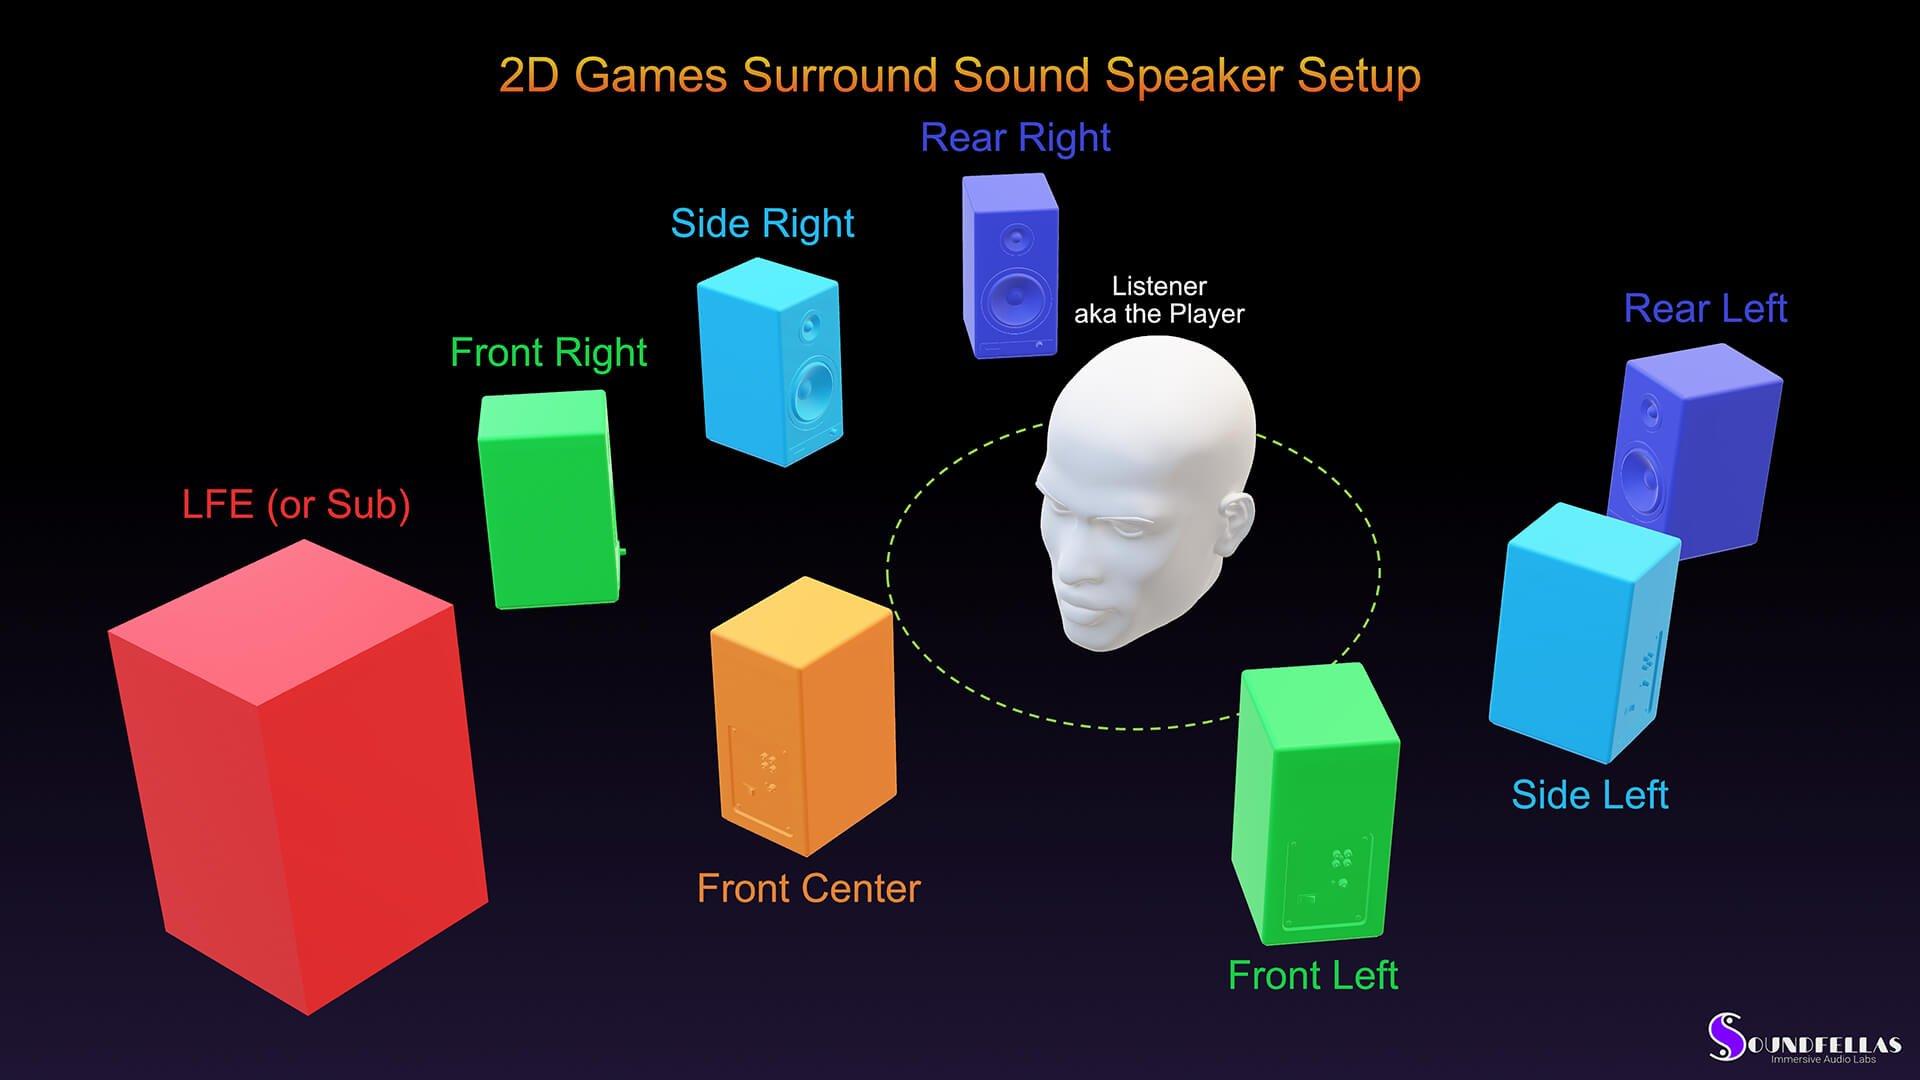 Image of 2D game surround sound speaker setup.